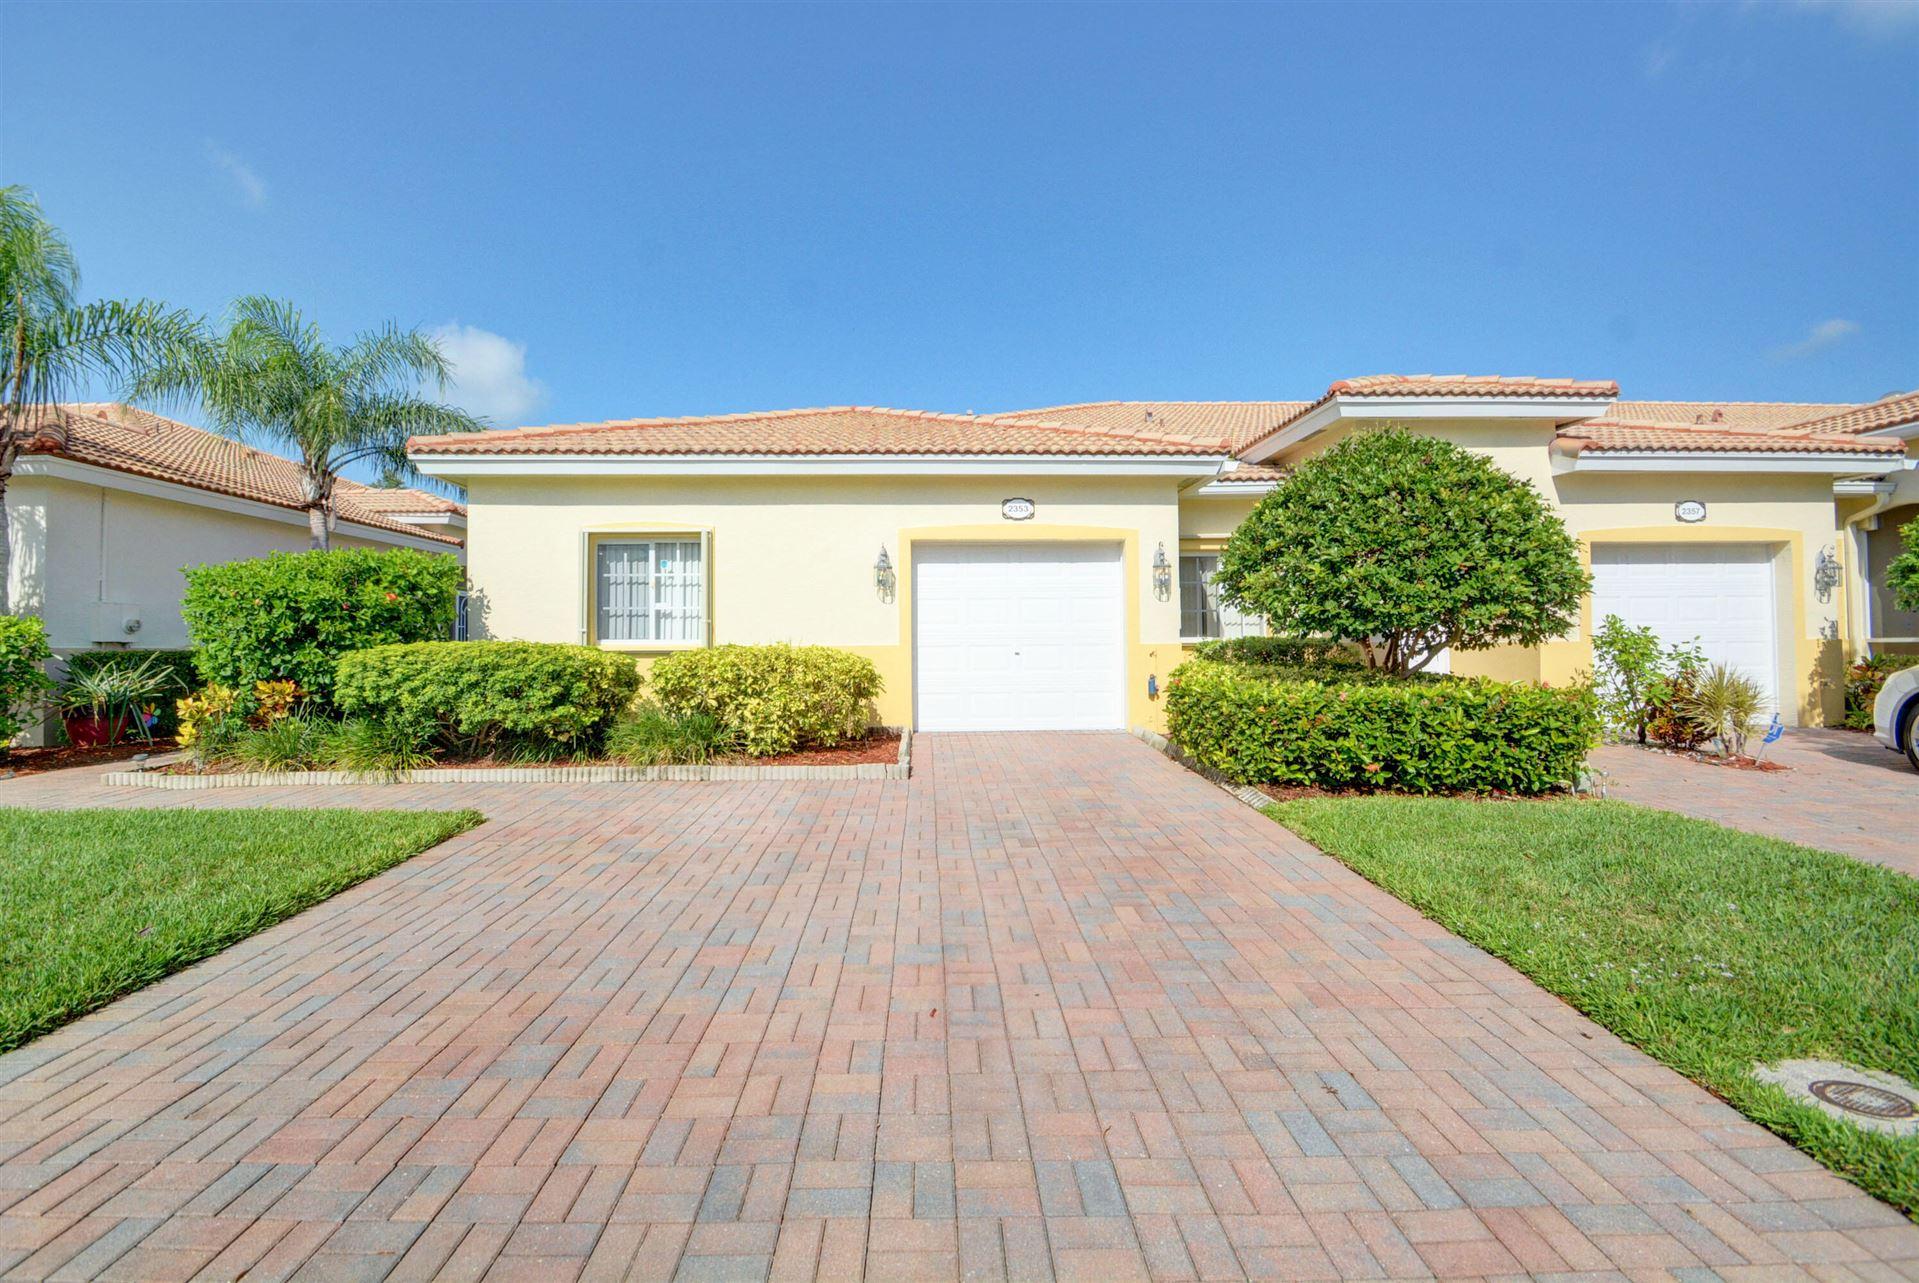 2353 Windjammer Way, Royal Palm Beach, FL 33411 - MLS#: RX-10744797